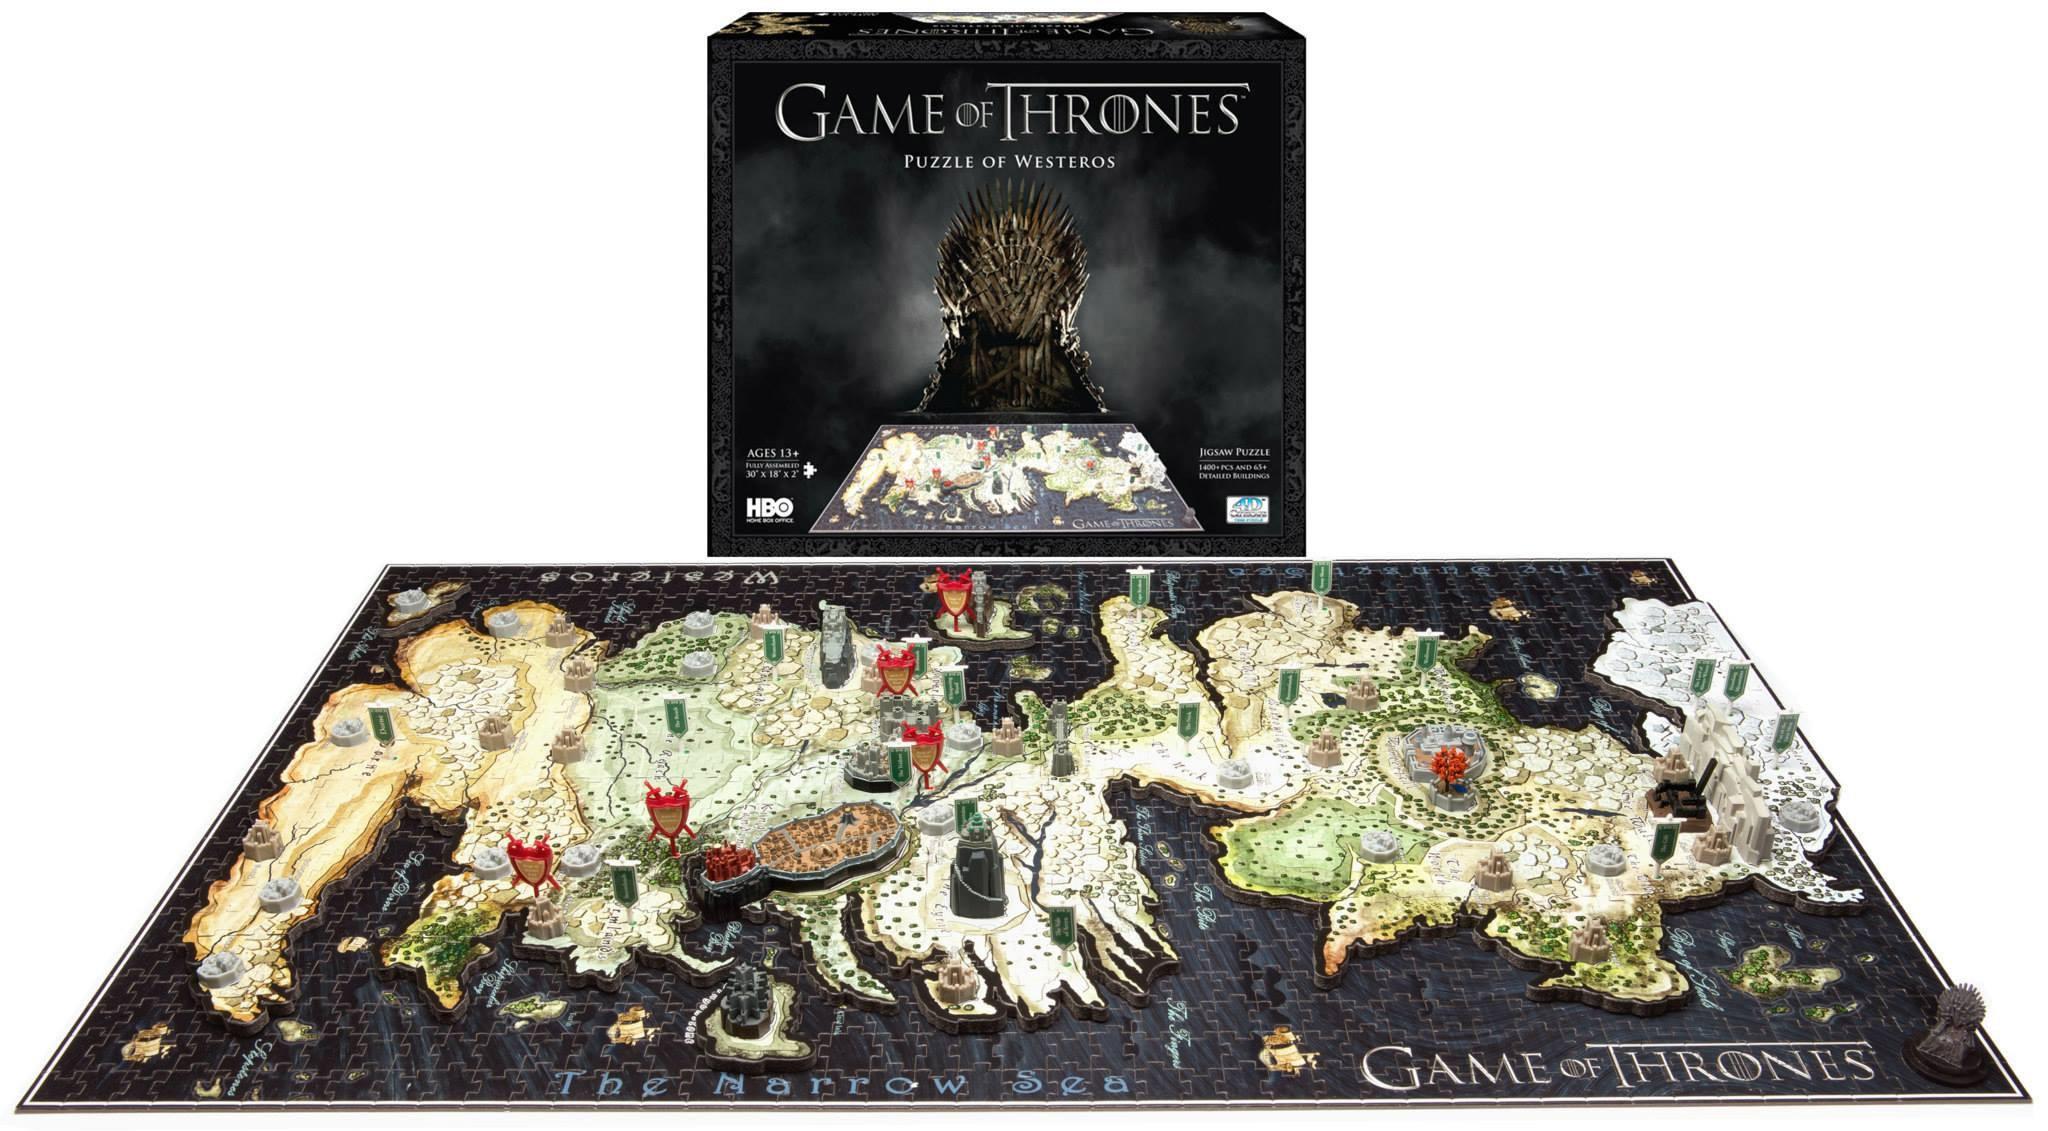 Game of Thrones 3D Puzzle Westeros (1400 pieces)